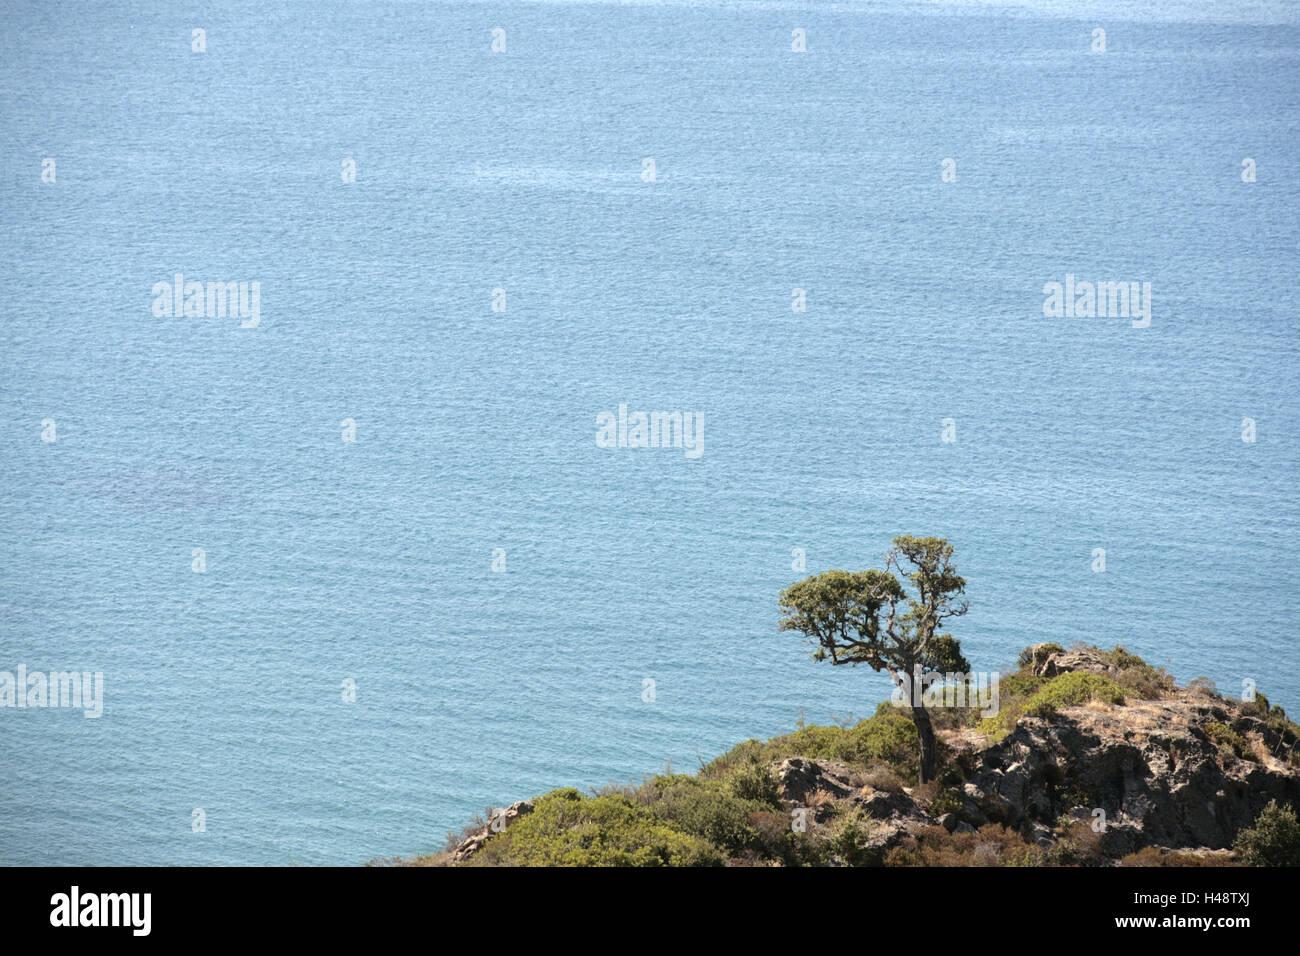 Italy, Sardinia, Bosa, coastal scenery, tree, sea, Europe, island, destination, nature, Macchia, scenery, coast, - Stock Image